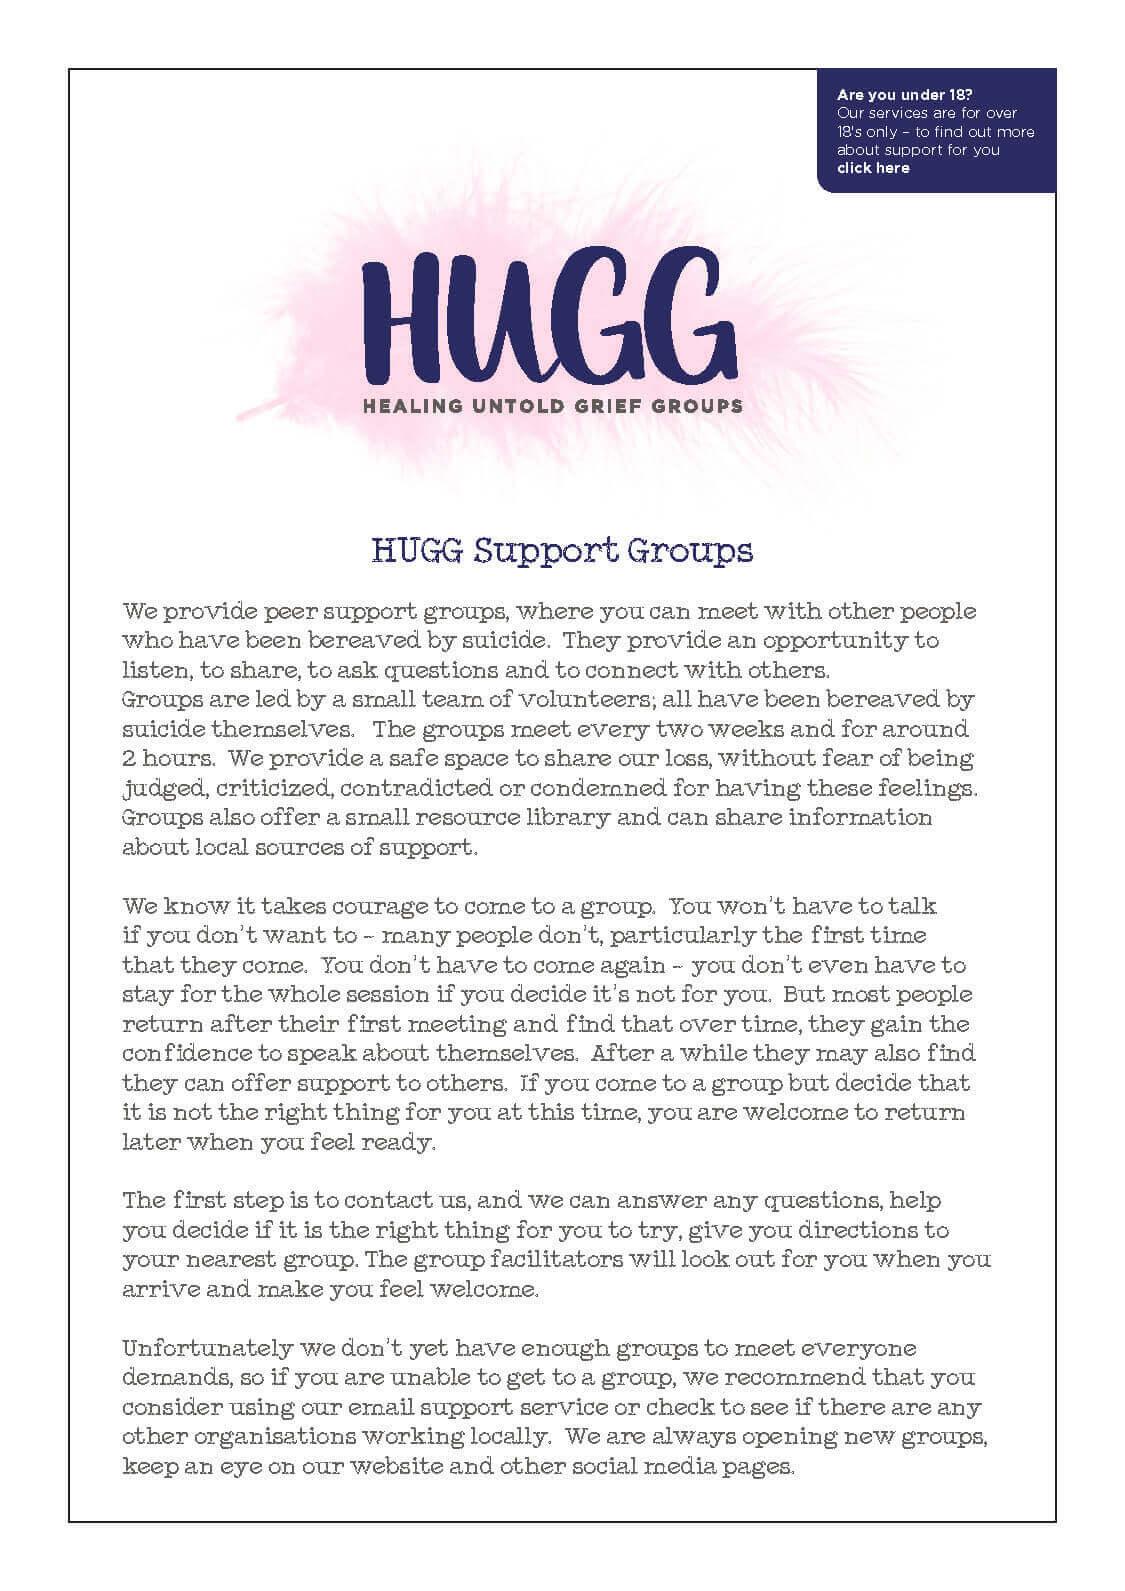 Hugg Meeting